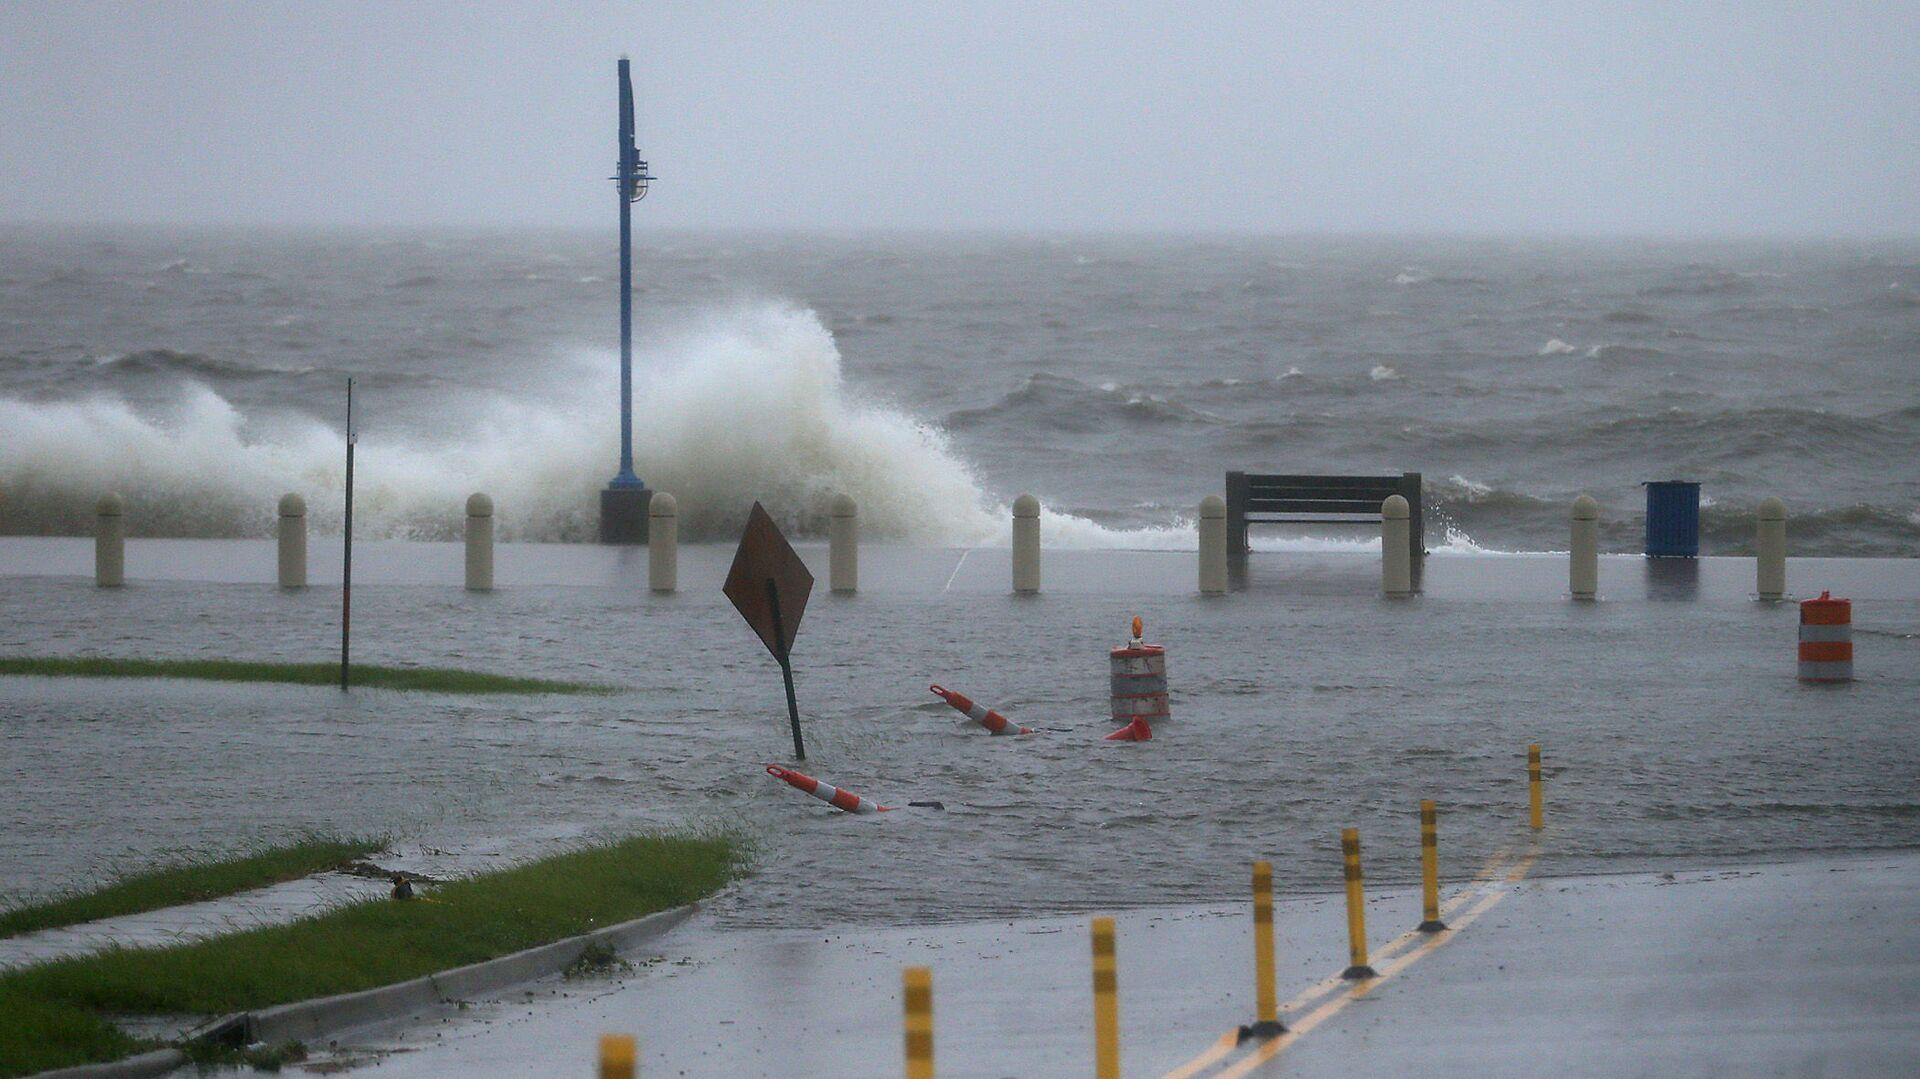 Tempesta tropicale Cristobal a New Orleans, 7 Giugno 2020 - Sputnik Italia, 1920, 09.09.2021